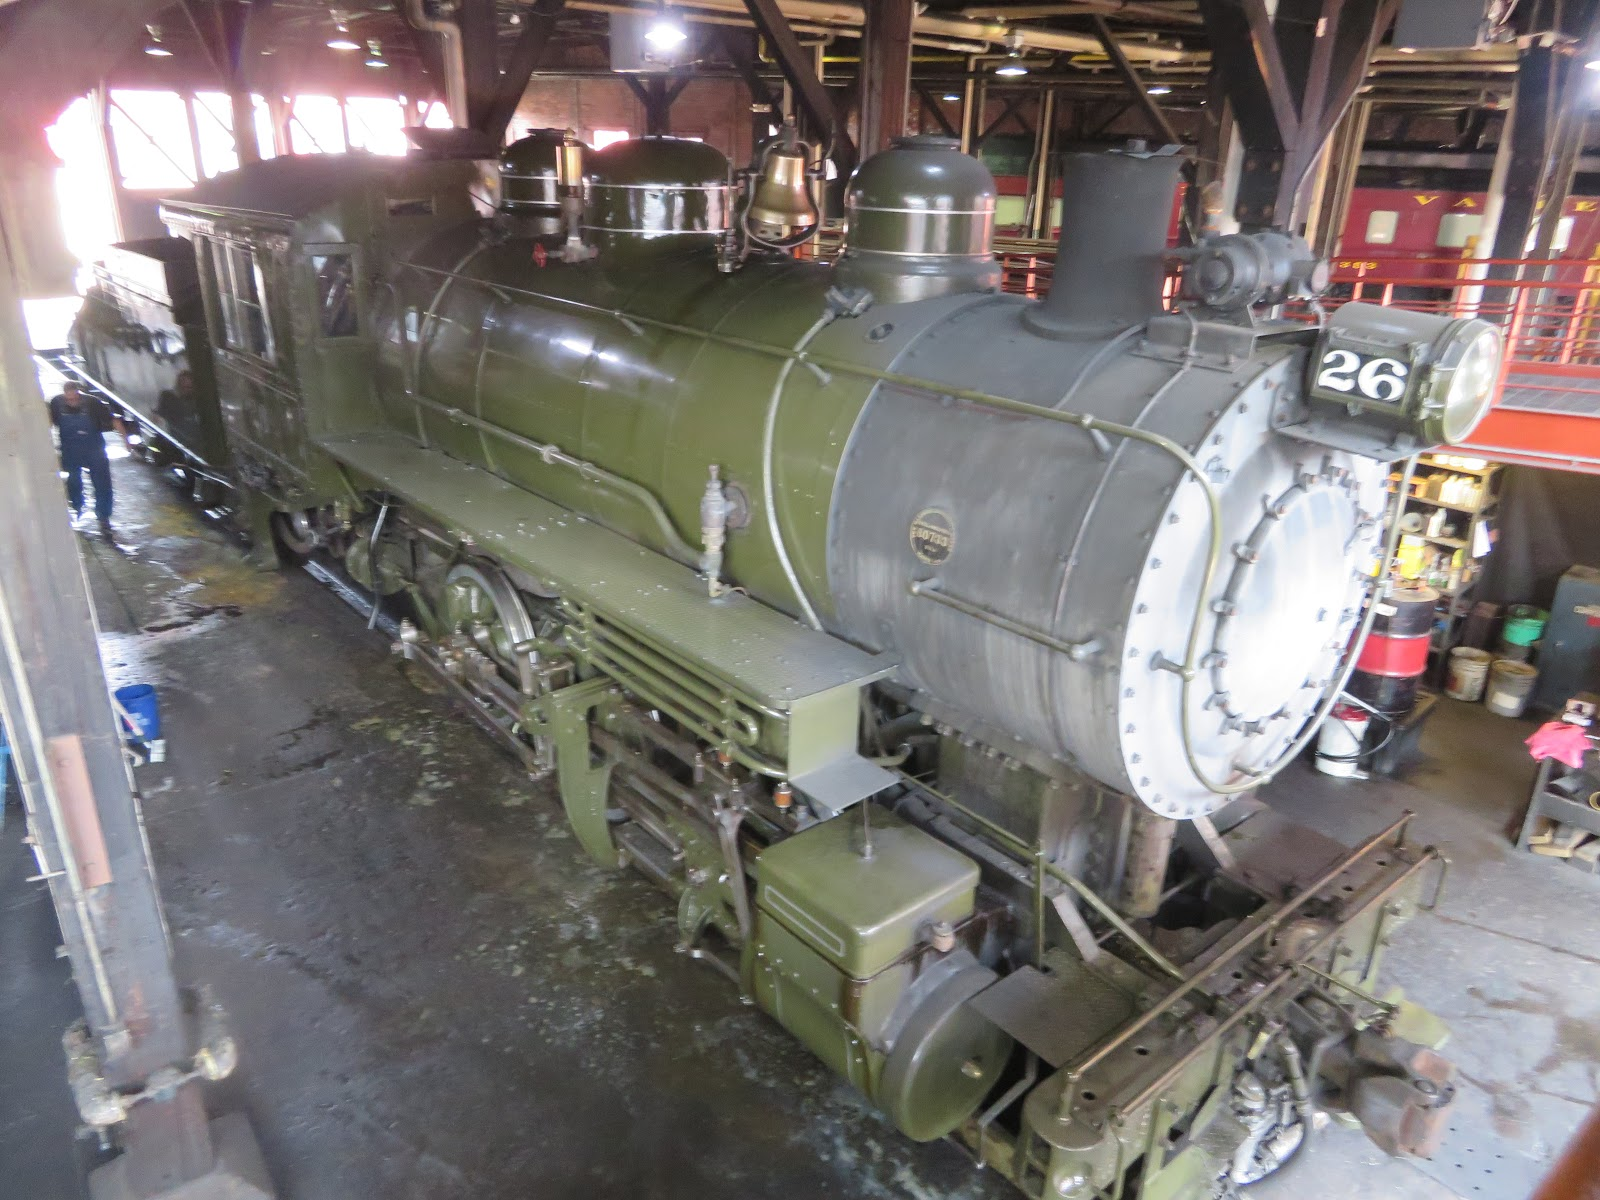 Big Daddy Dave: A Plethora of Trains and Trolleys!